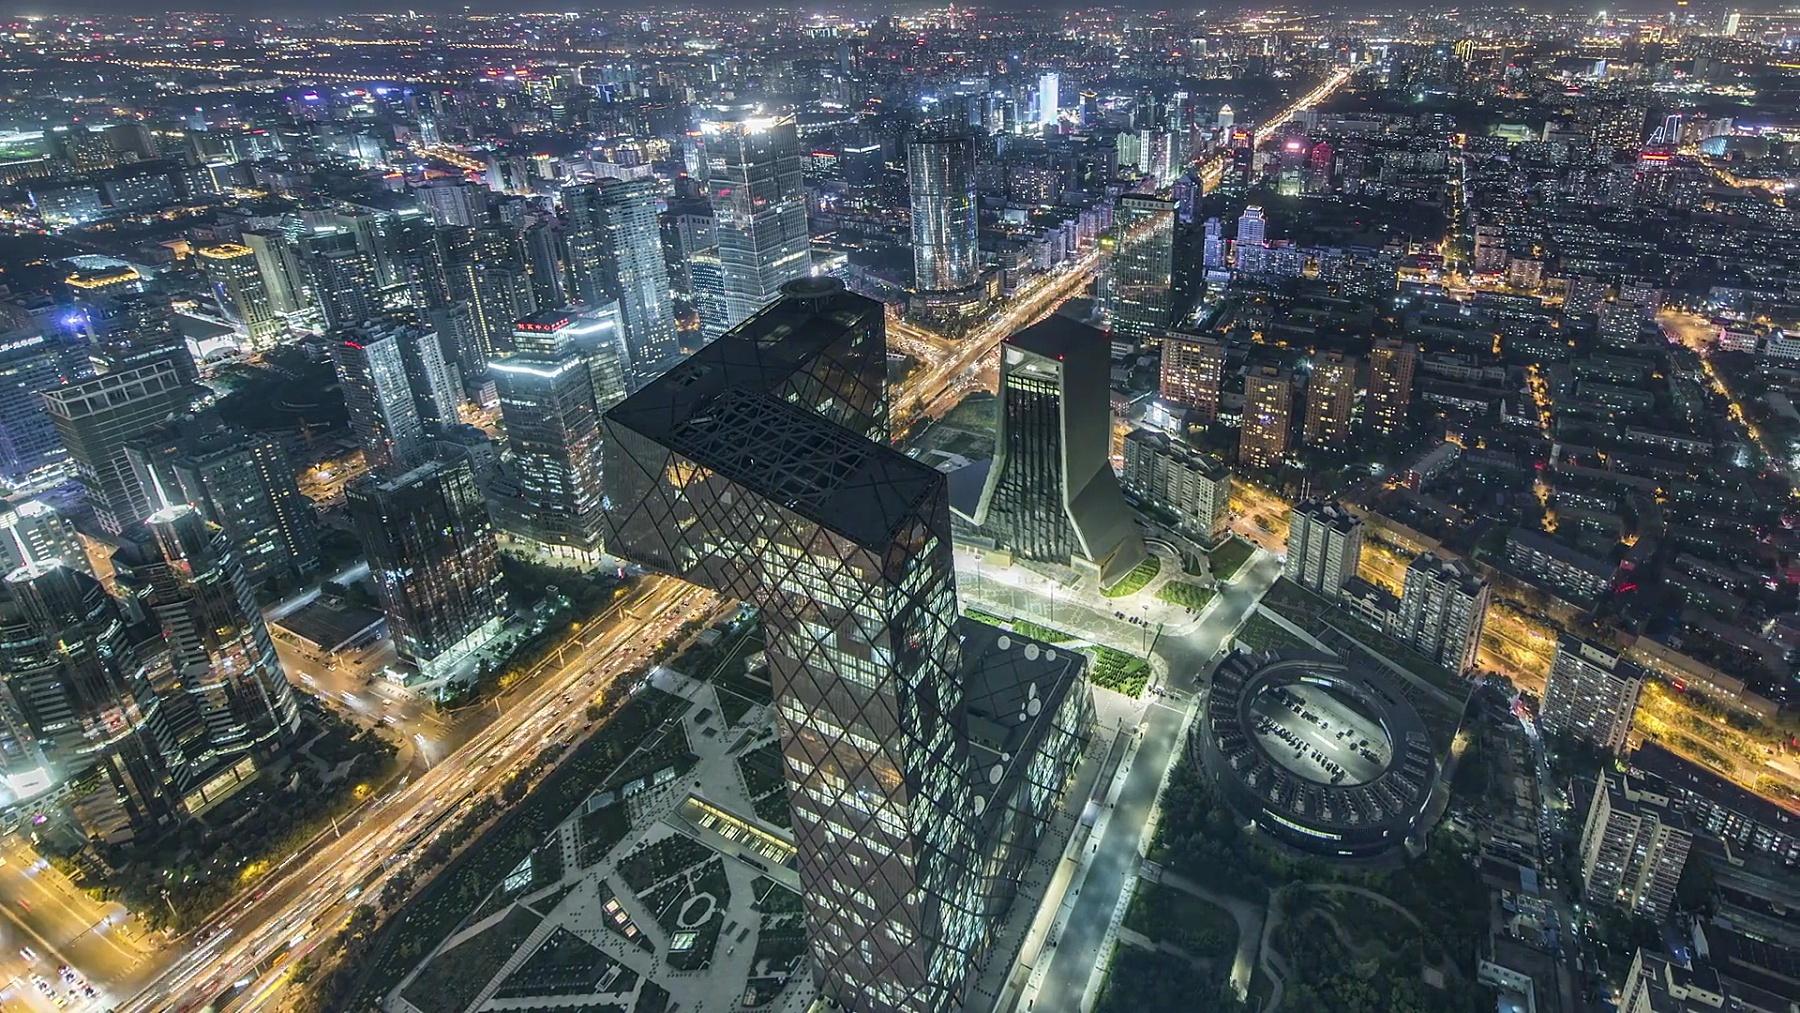 T/L WS HA PAN夜间/北京CBD区域鸟瞰